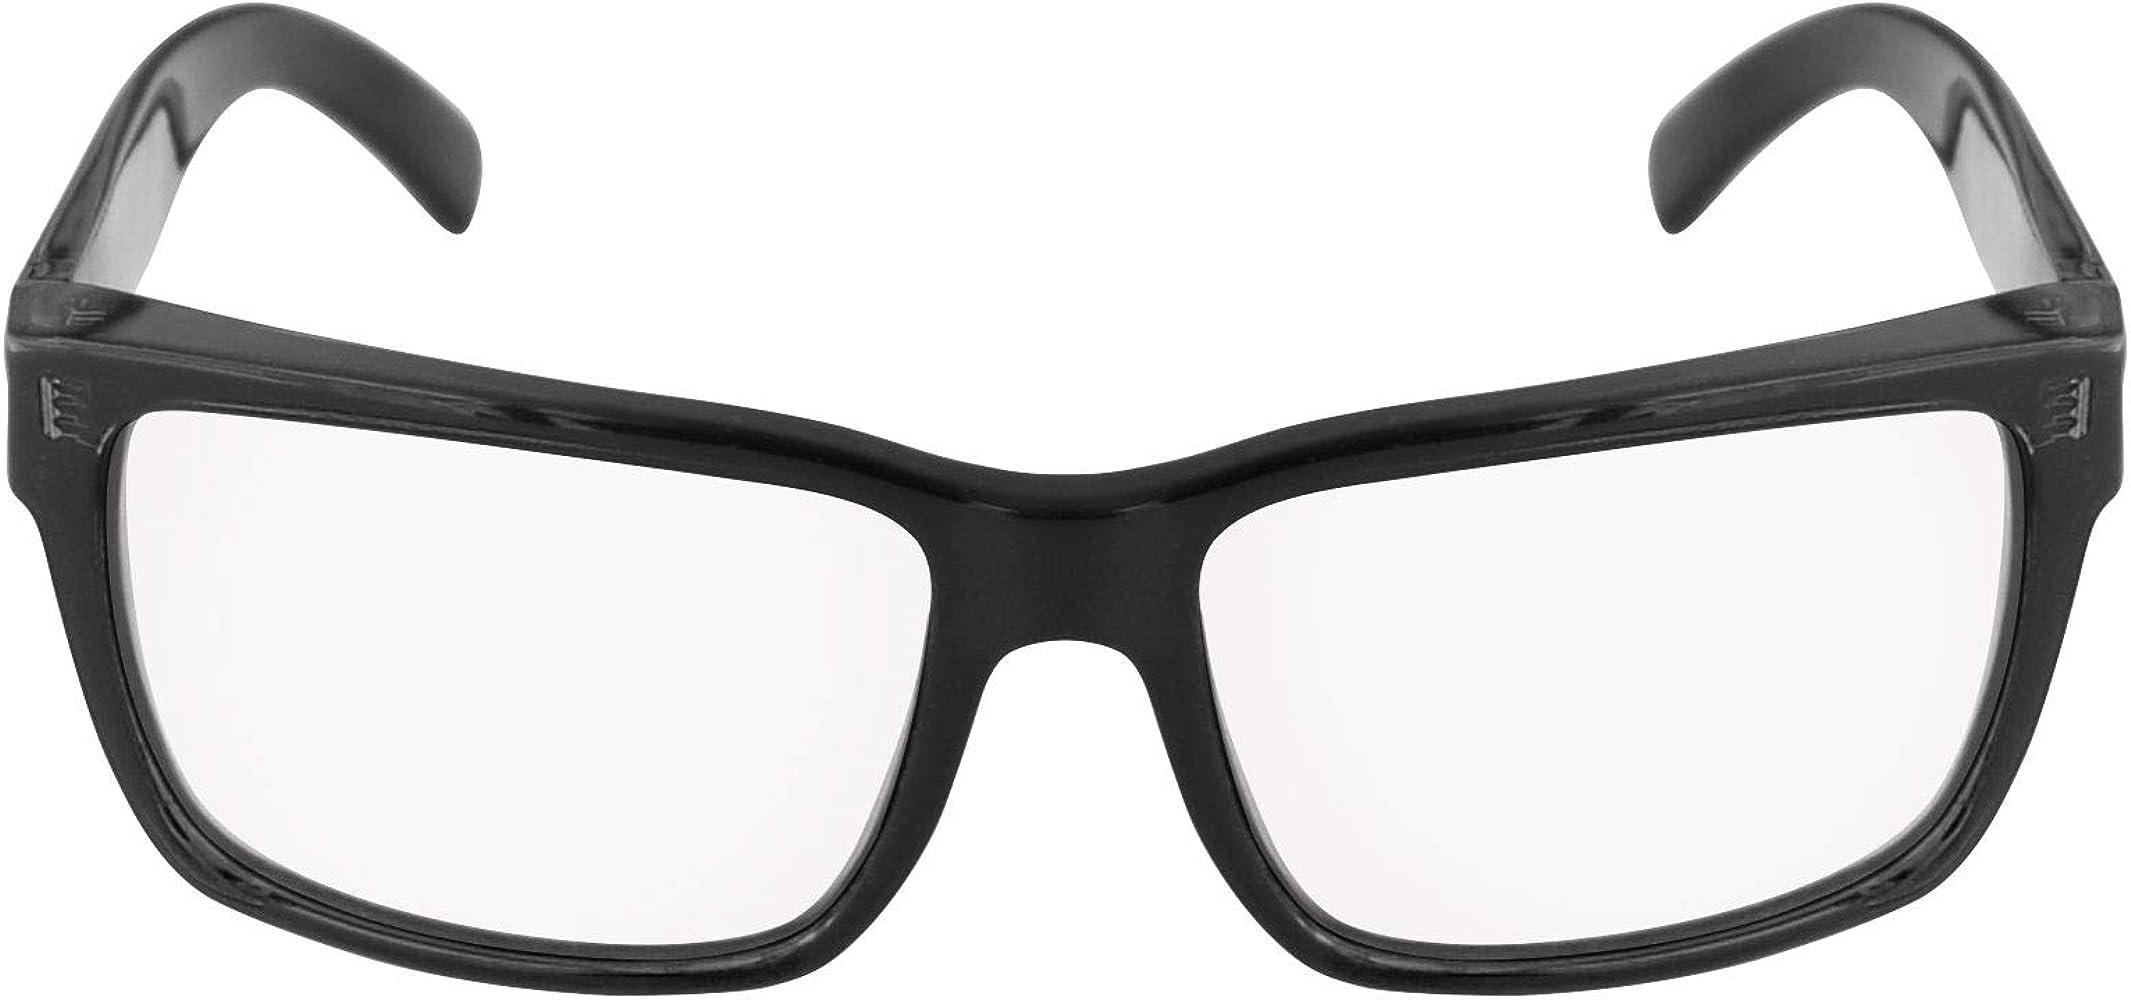 Fuse Lenses Polarized Replacement Lenses for Von Zipper Levee